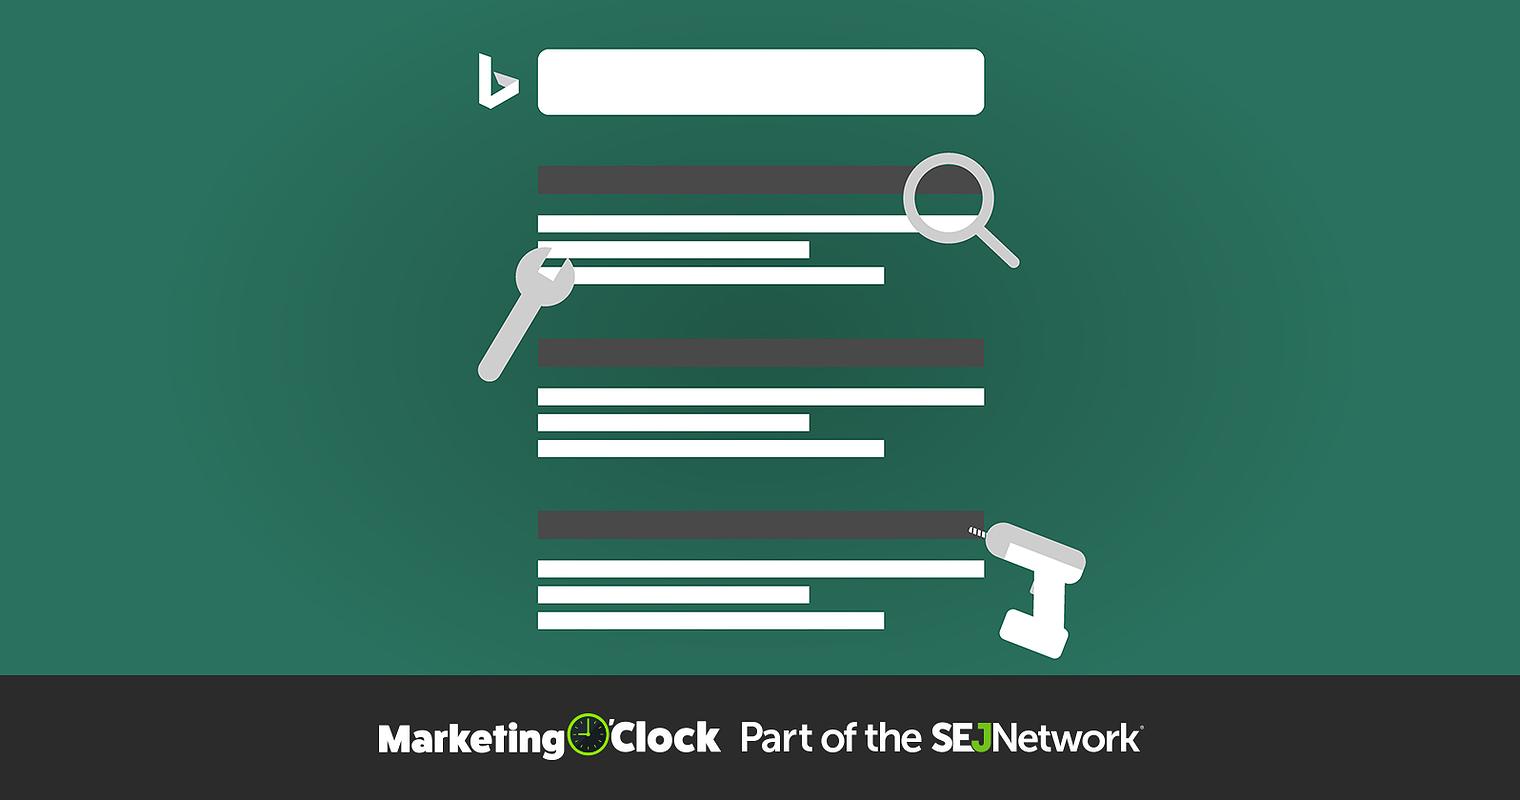 Bing News PubHub & This Week's Digital Marketing News [PODCAST]